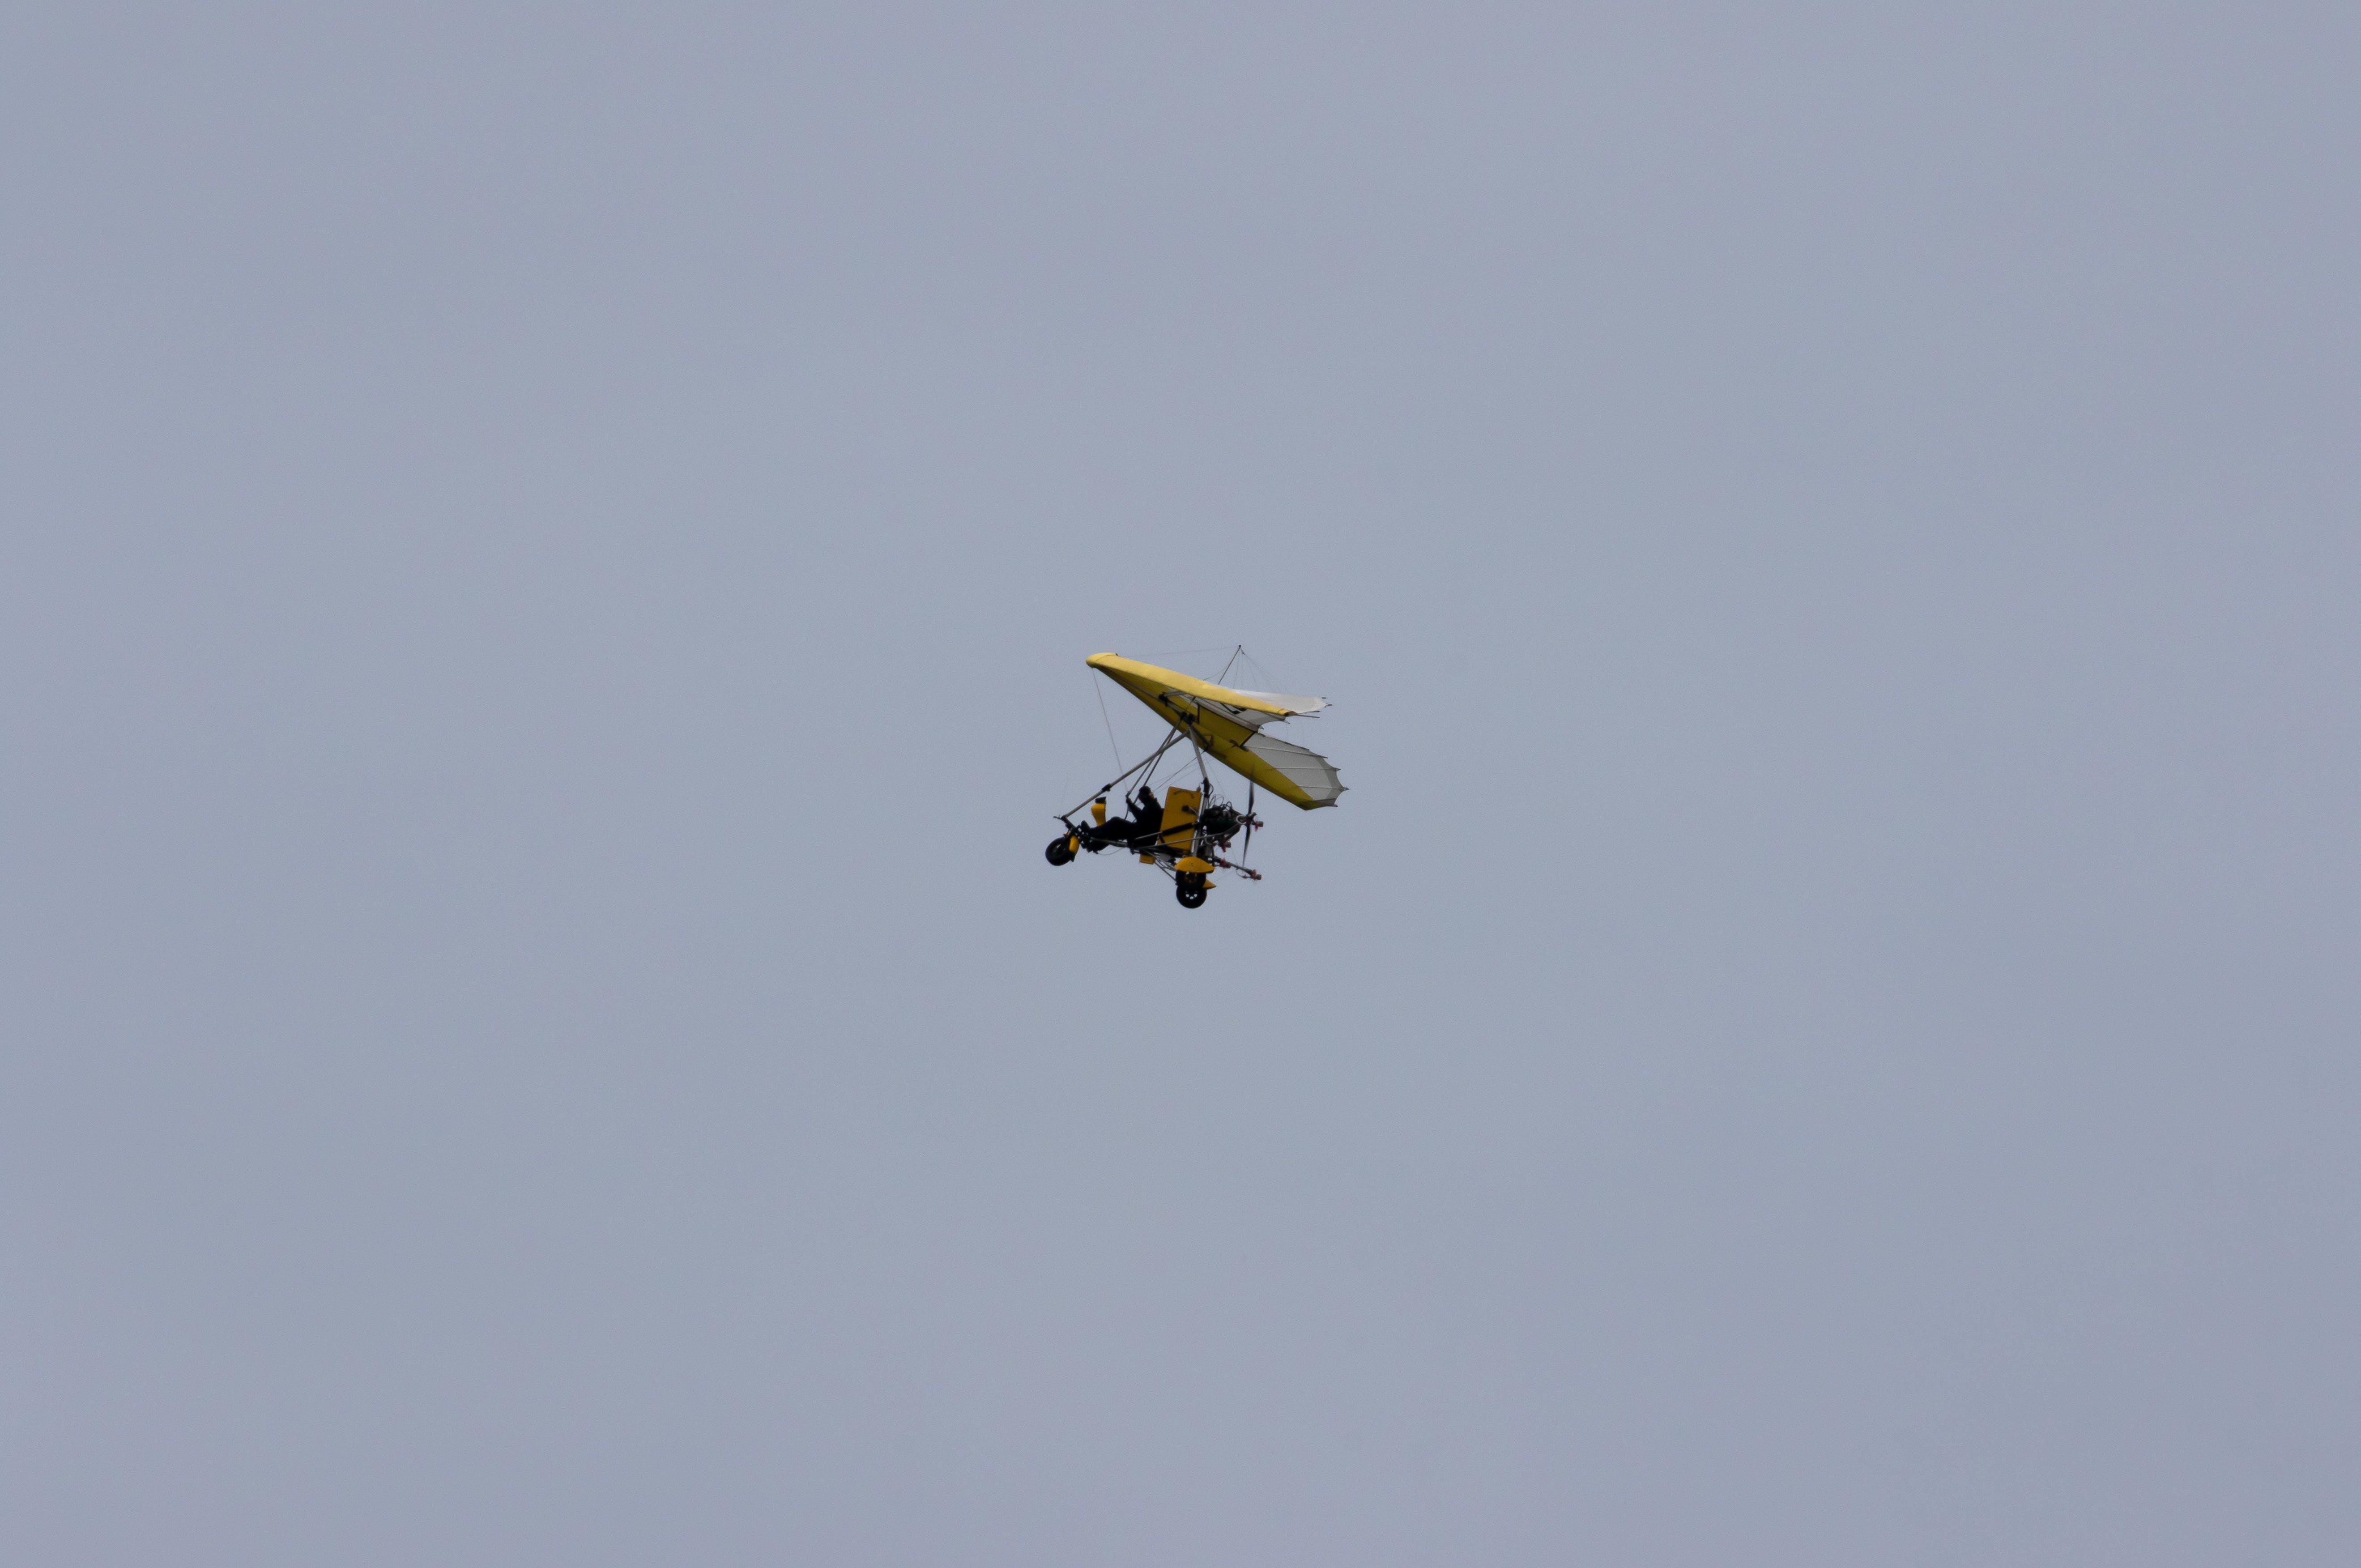 Free stock photo of adventure, aeroplane, blue sky, explore